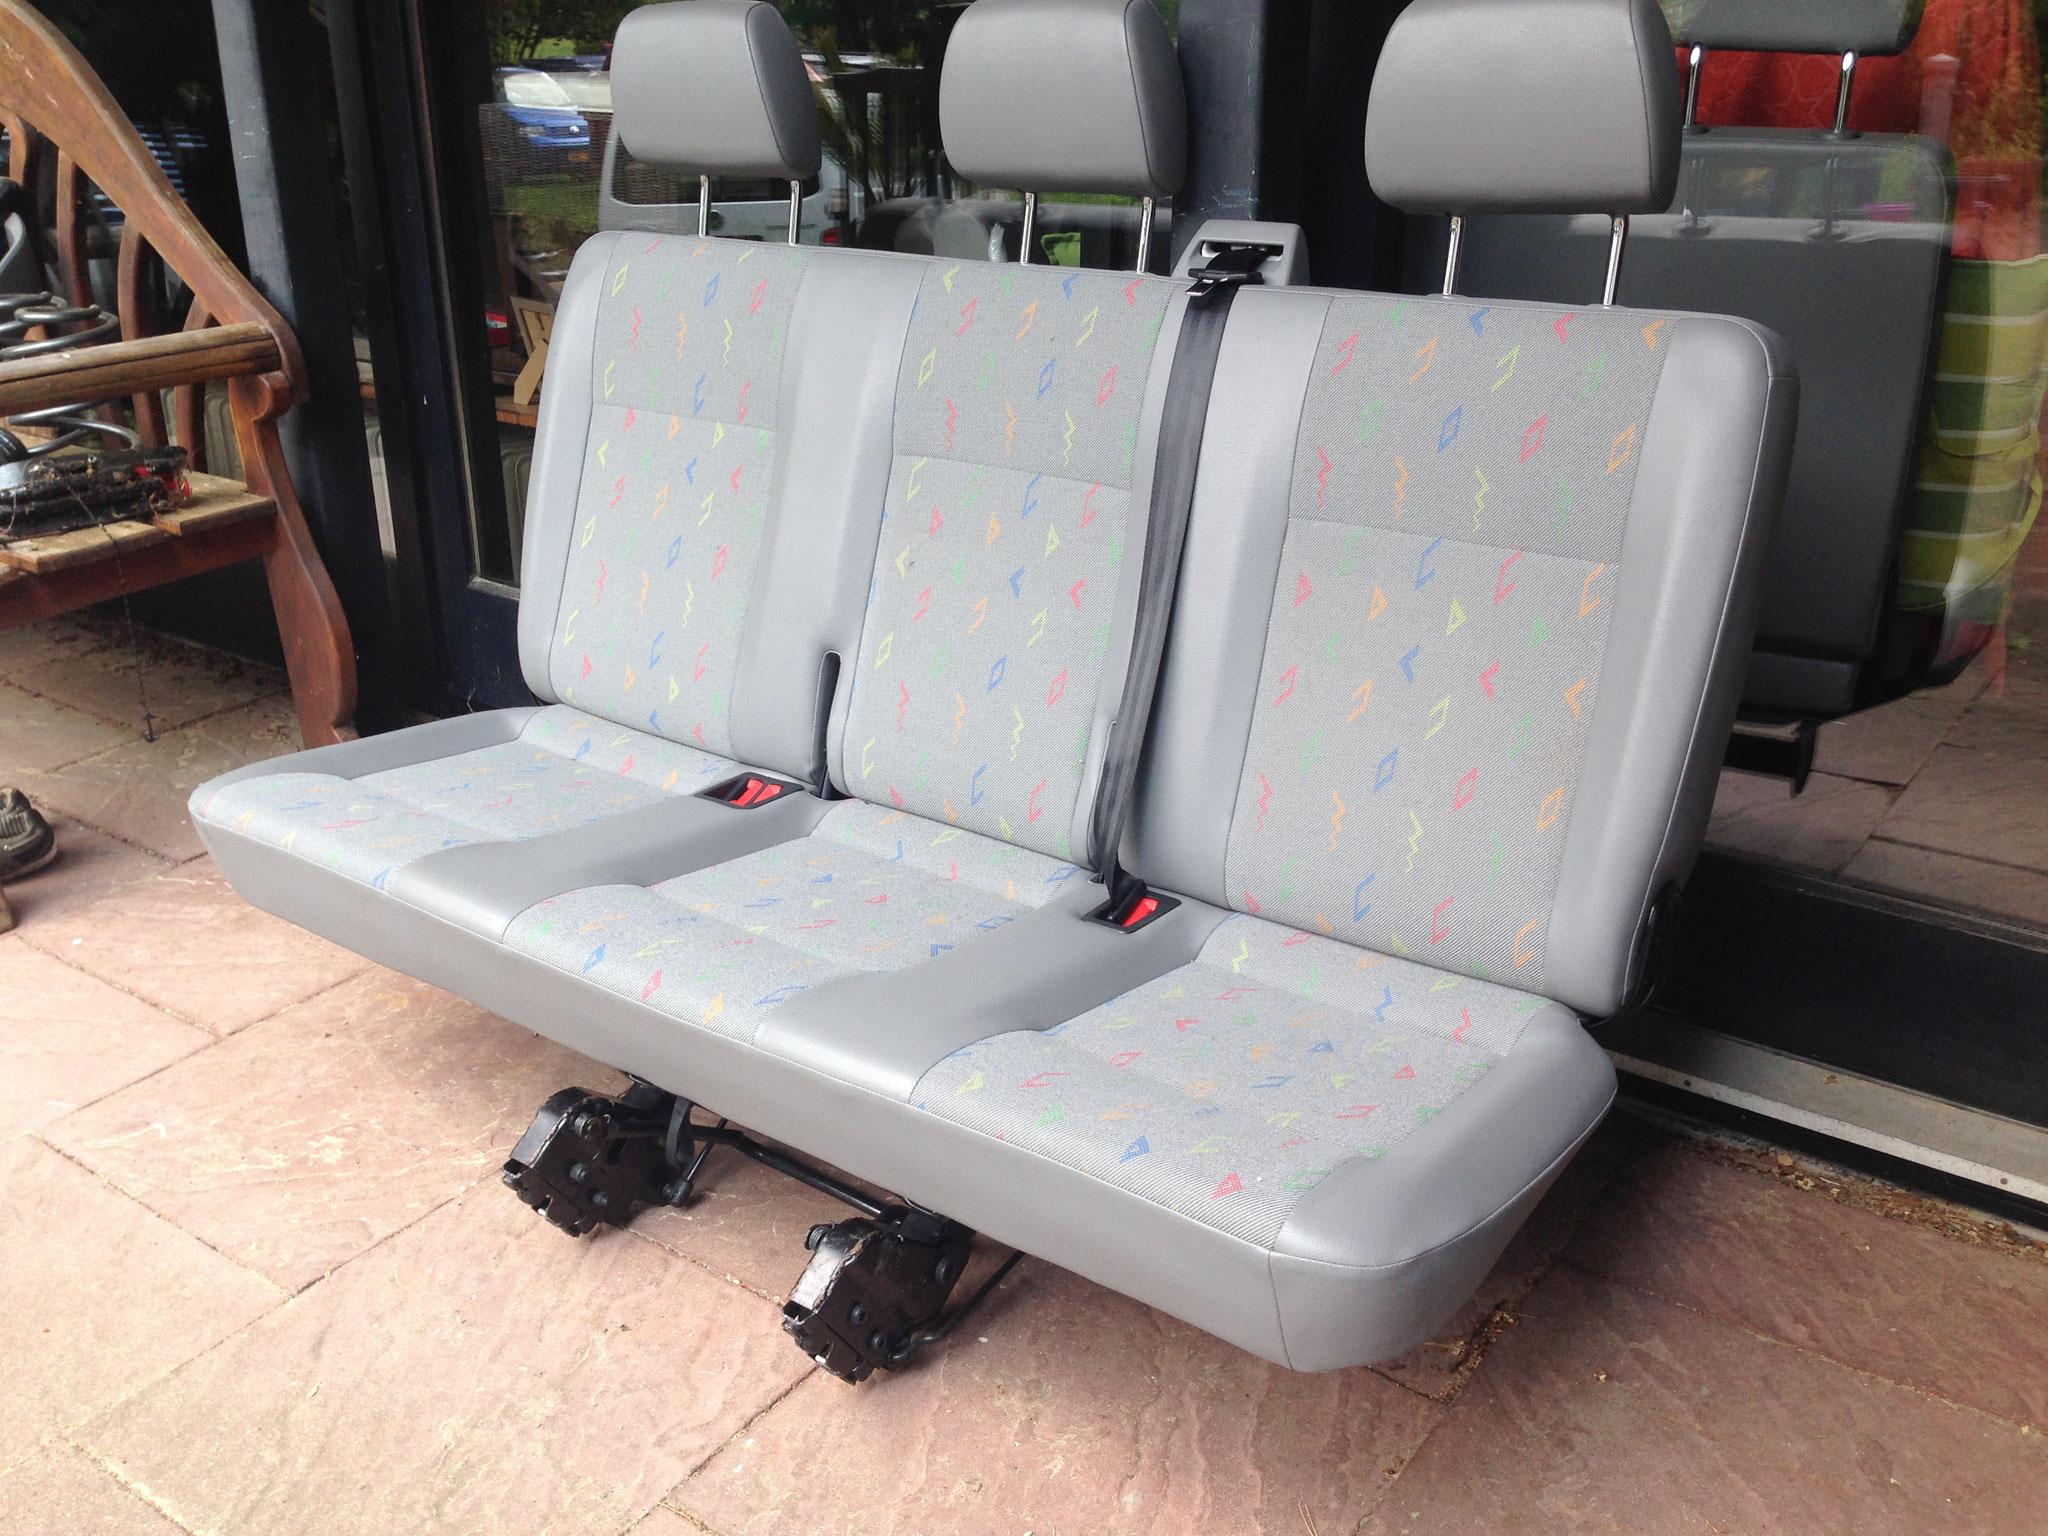 vw t5 original sitze reisemobile jesteburg. Black Bedroom Furniture Sets. Home Design Ideas